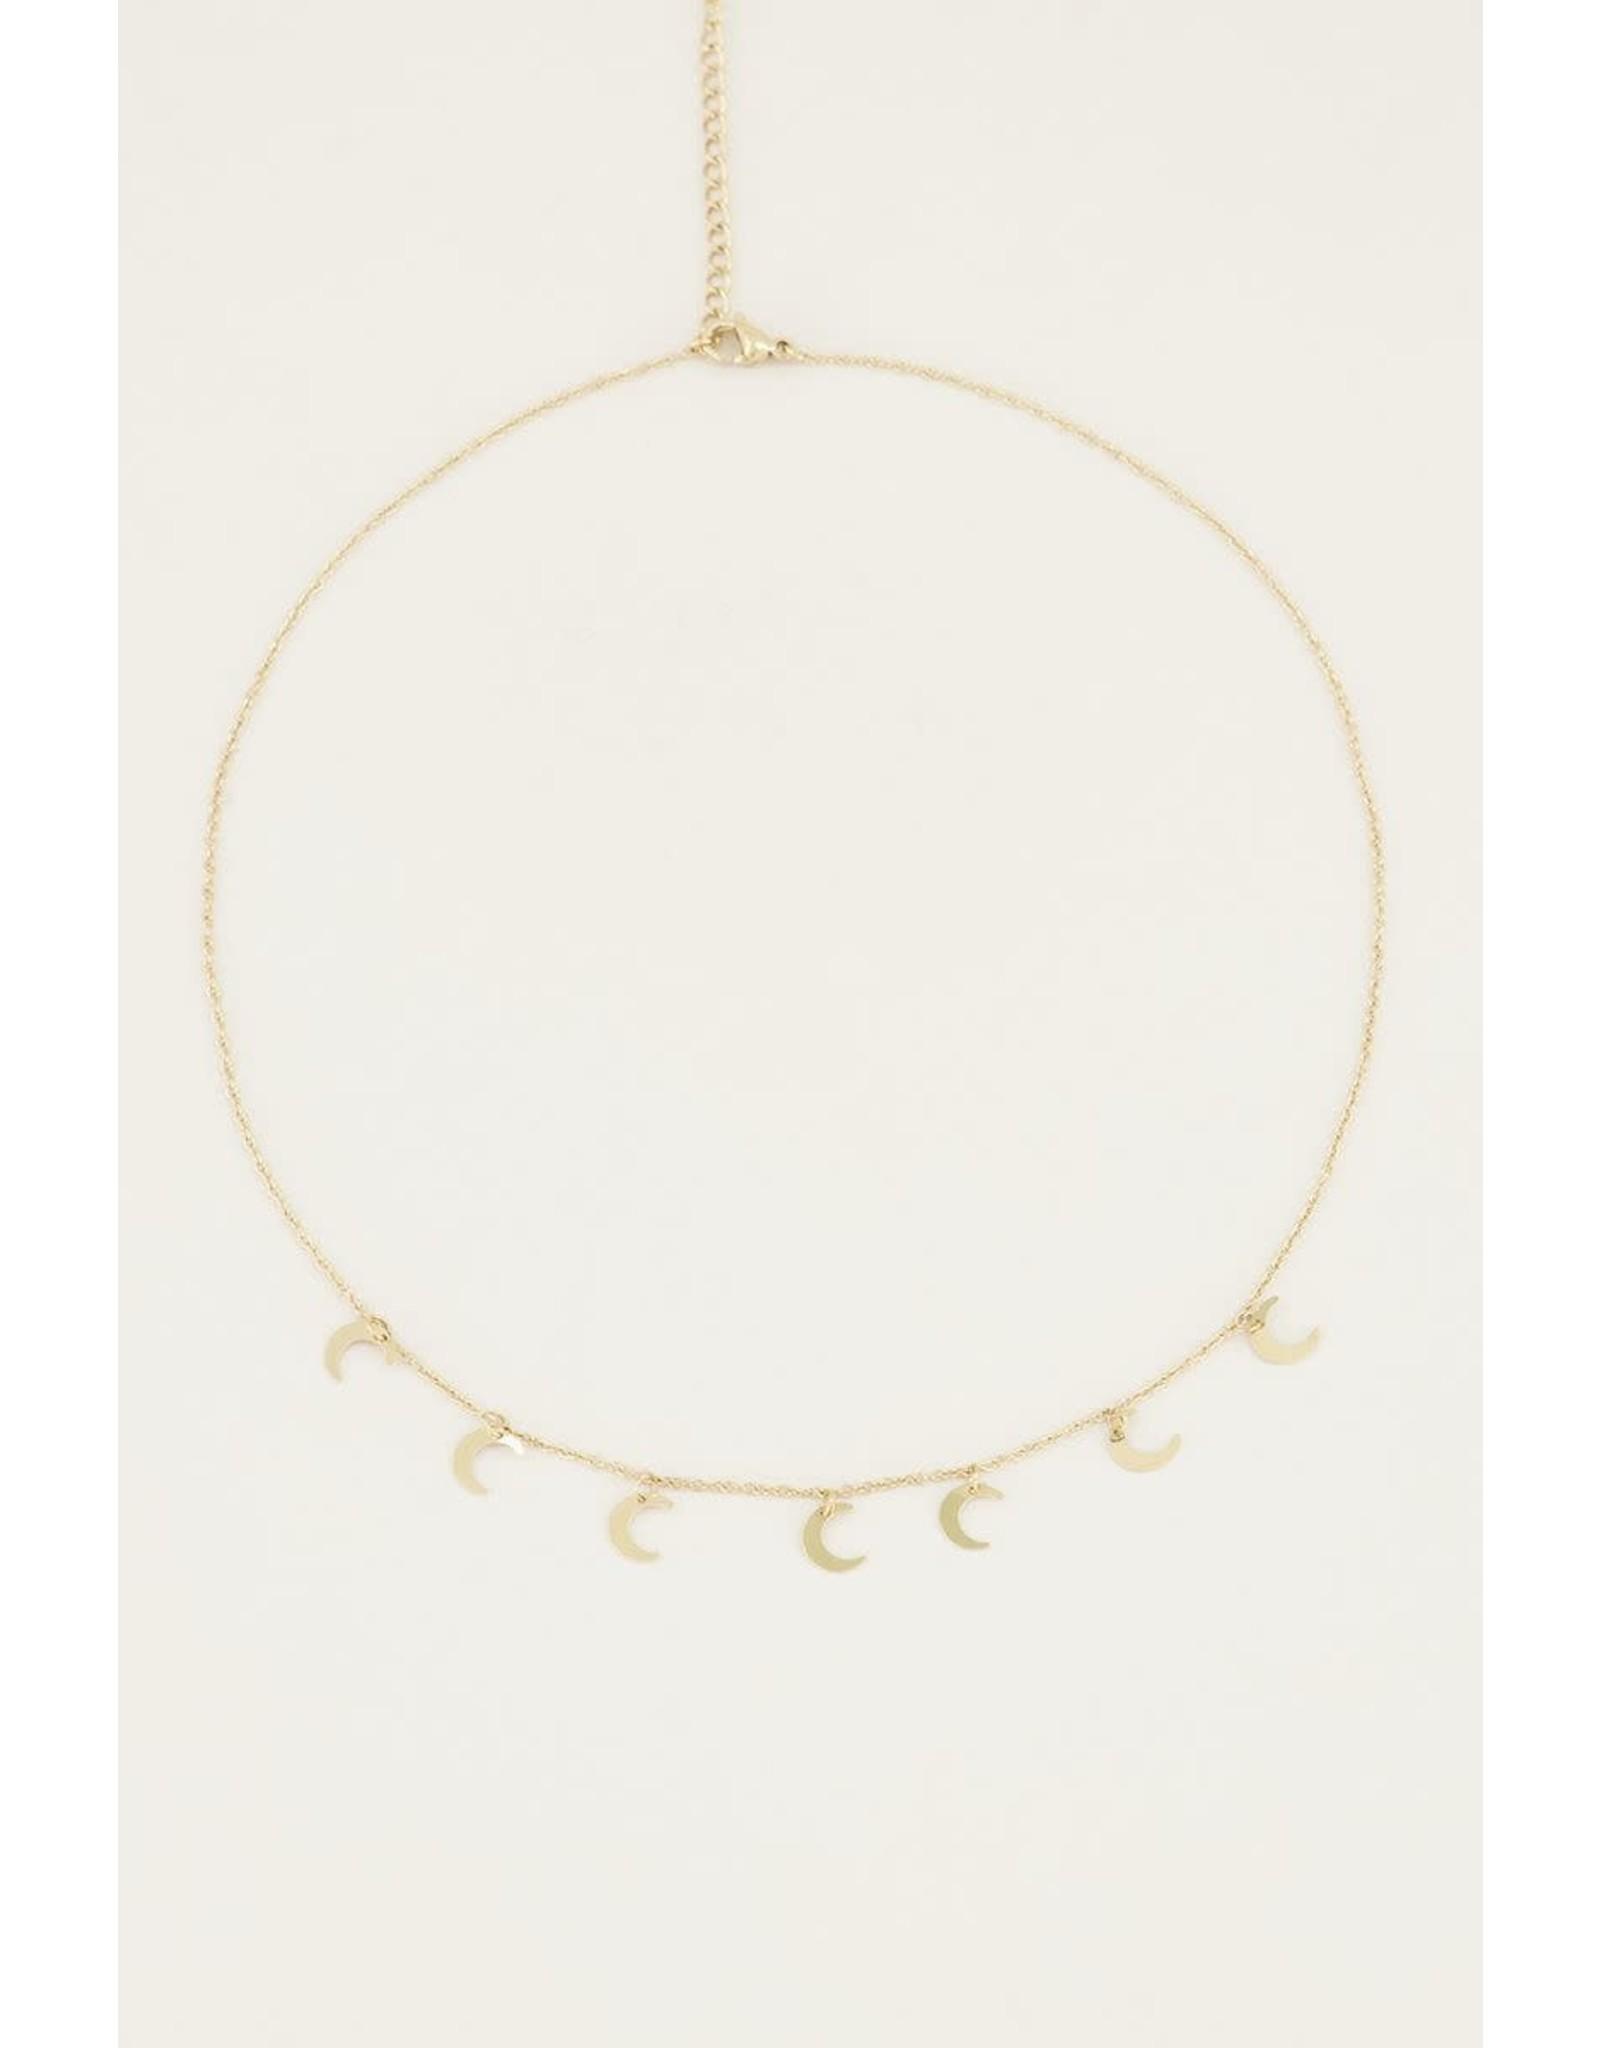 My Jewellery Ketting kleine maantjes